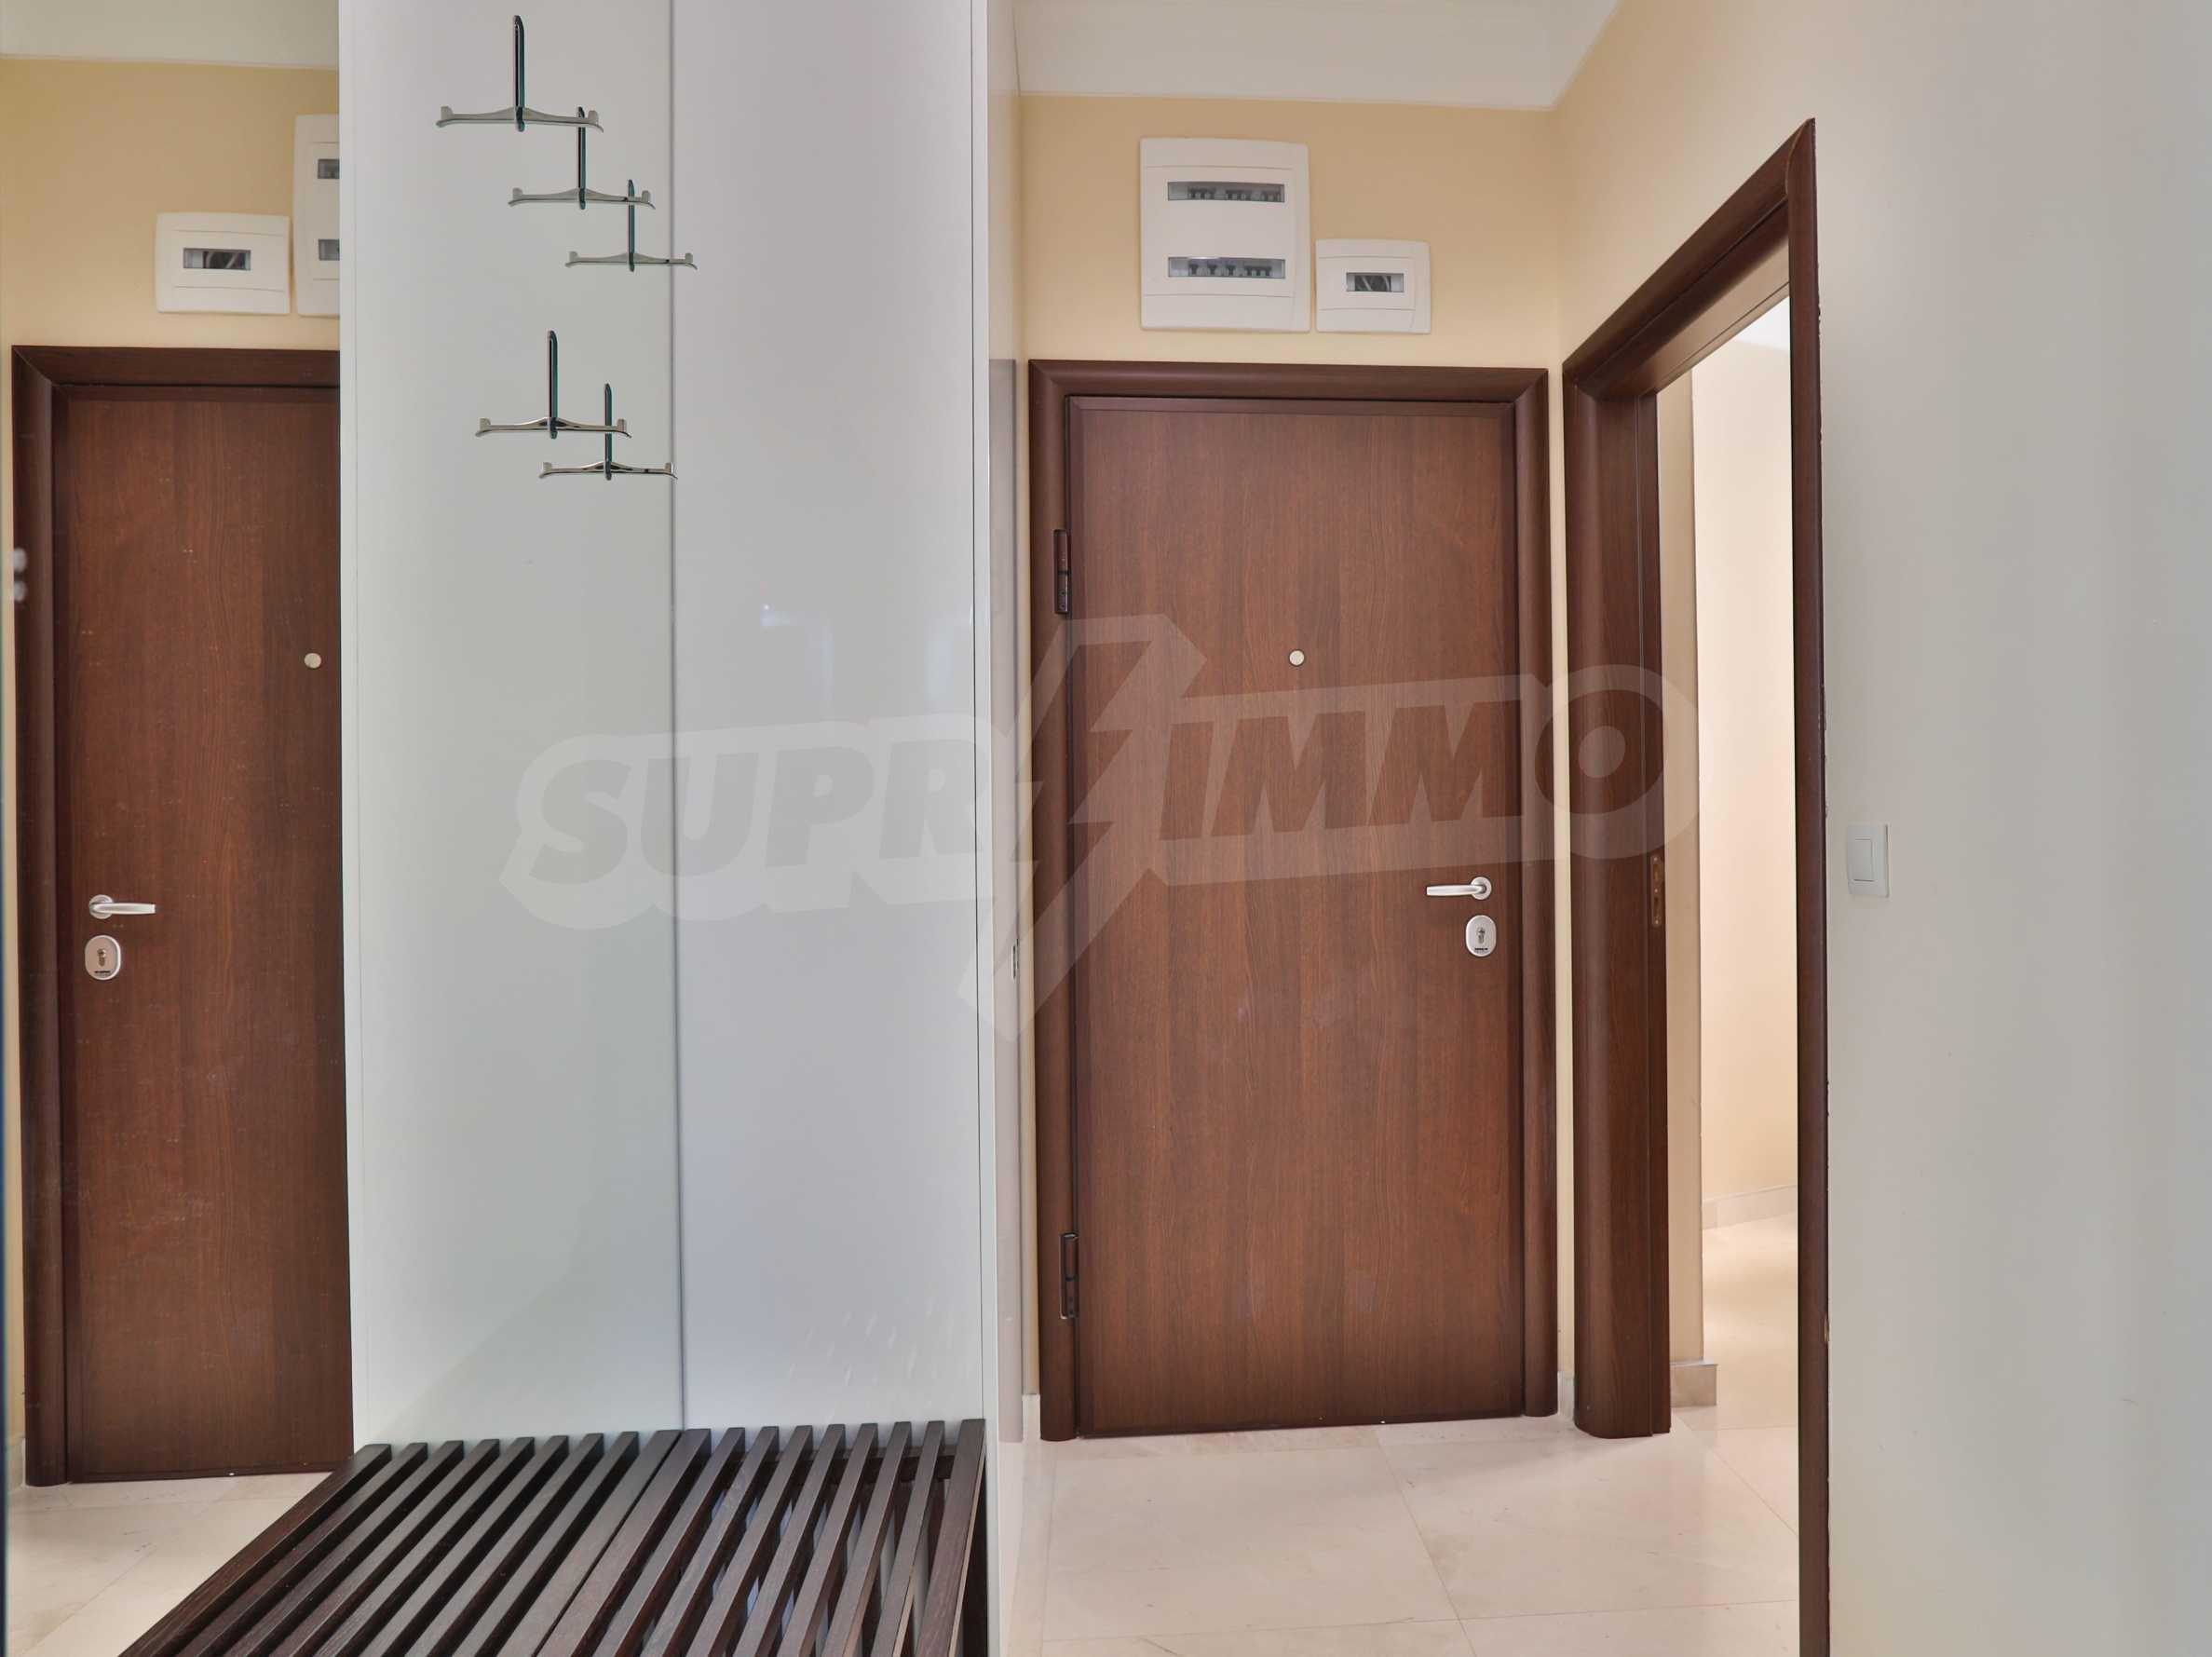 Дизайнерски тристаен апартамент под наем за летен сезон в резиденция Belle Époque в Лозенец 26